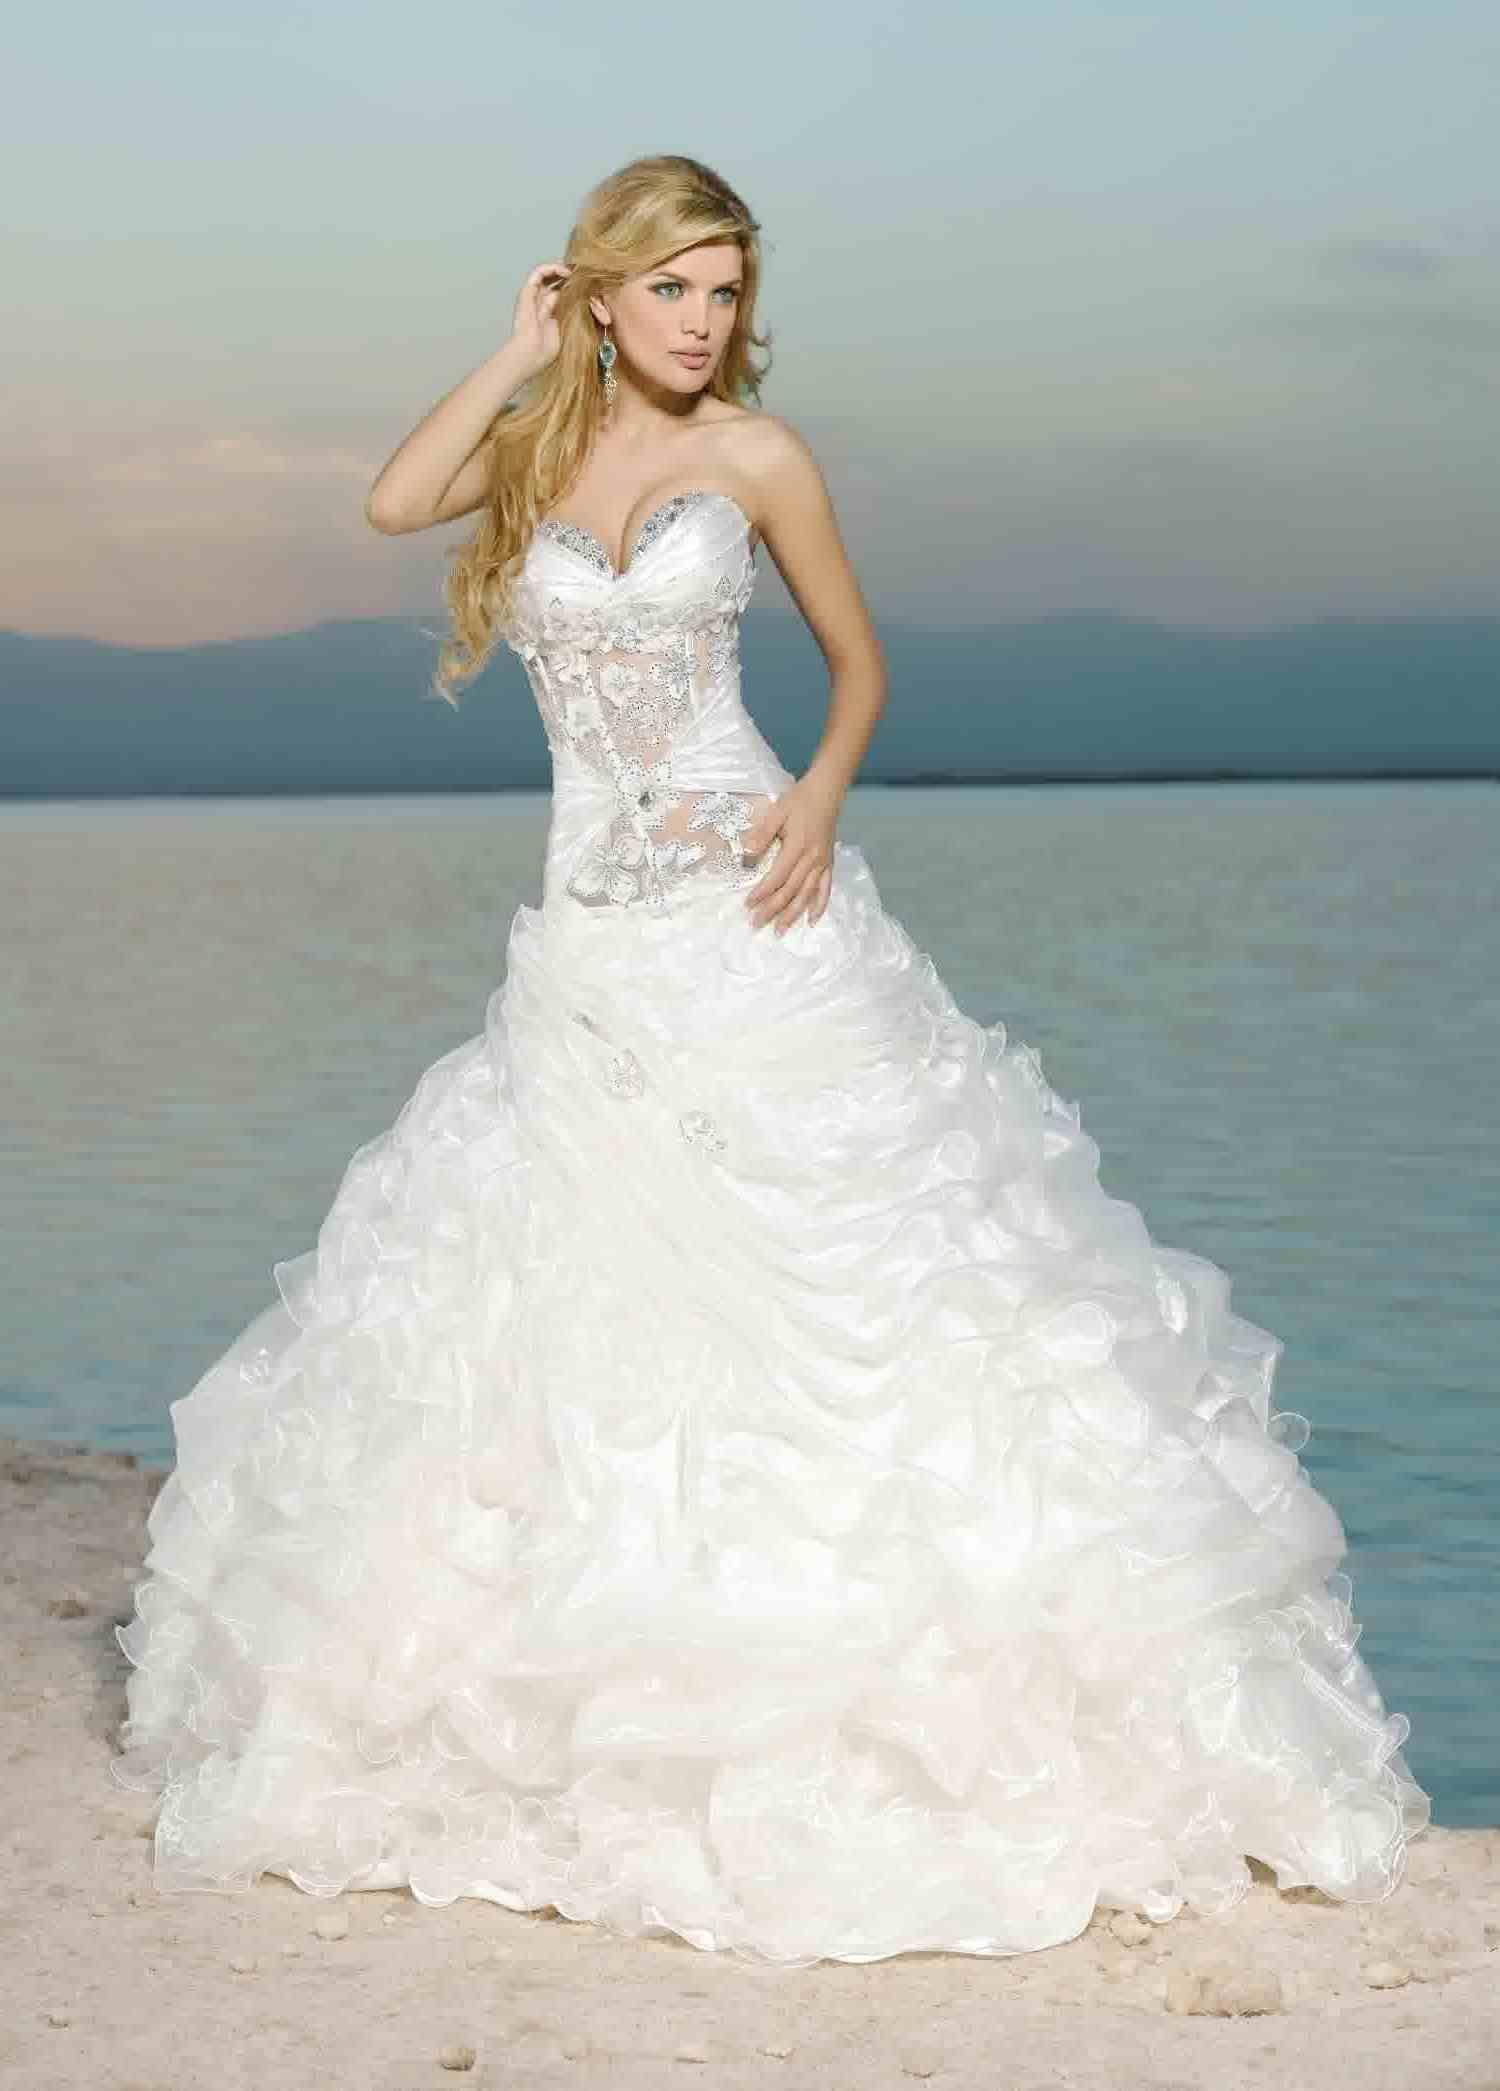 pre owned wedding dresses | wedding dresses | Pinterest | Wedding ...